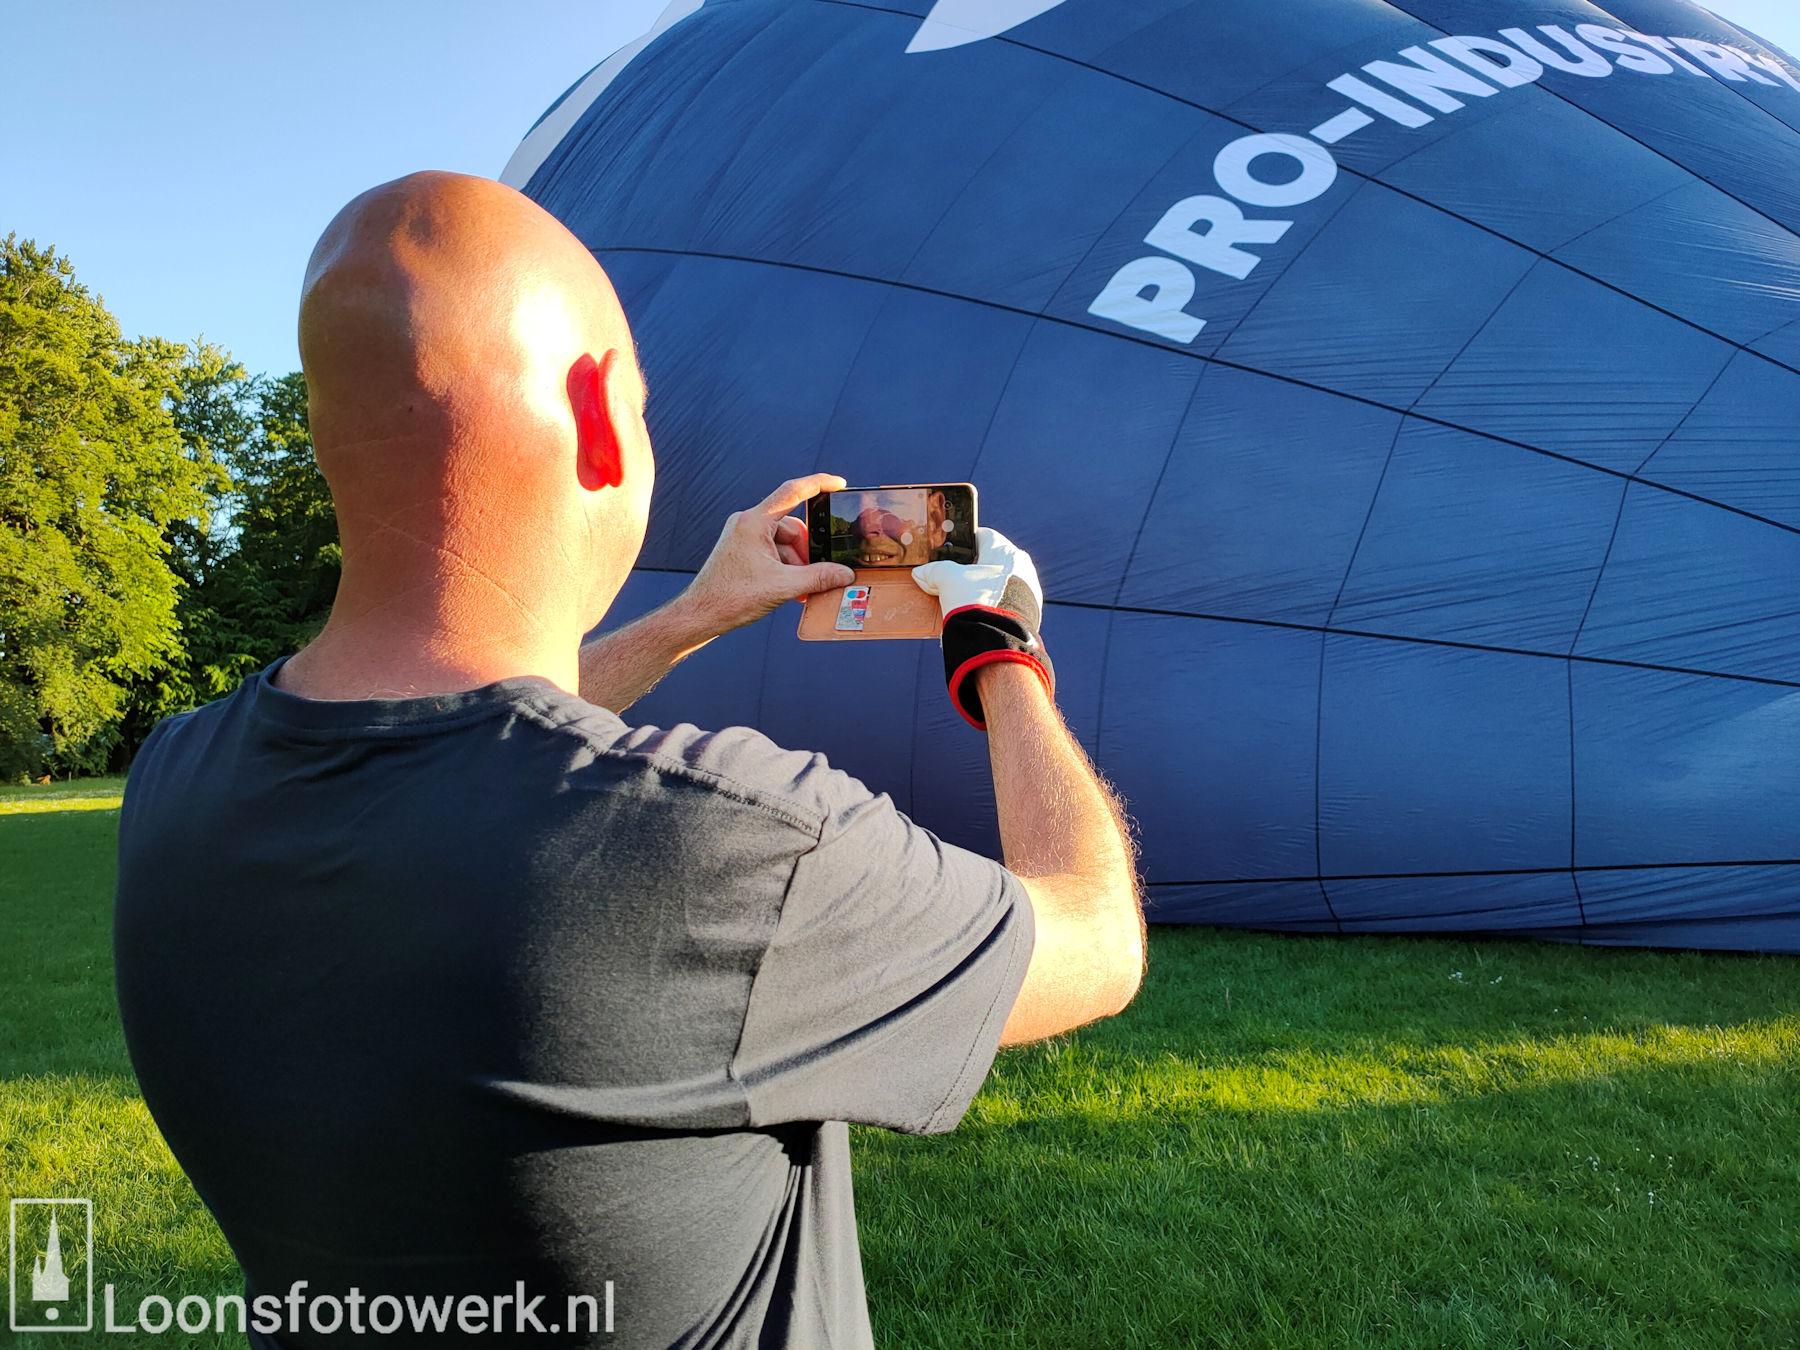 Ballonvaart vanaf de Kasteelweide 6